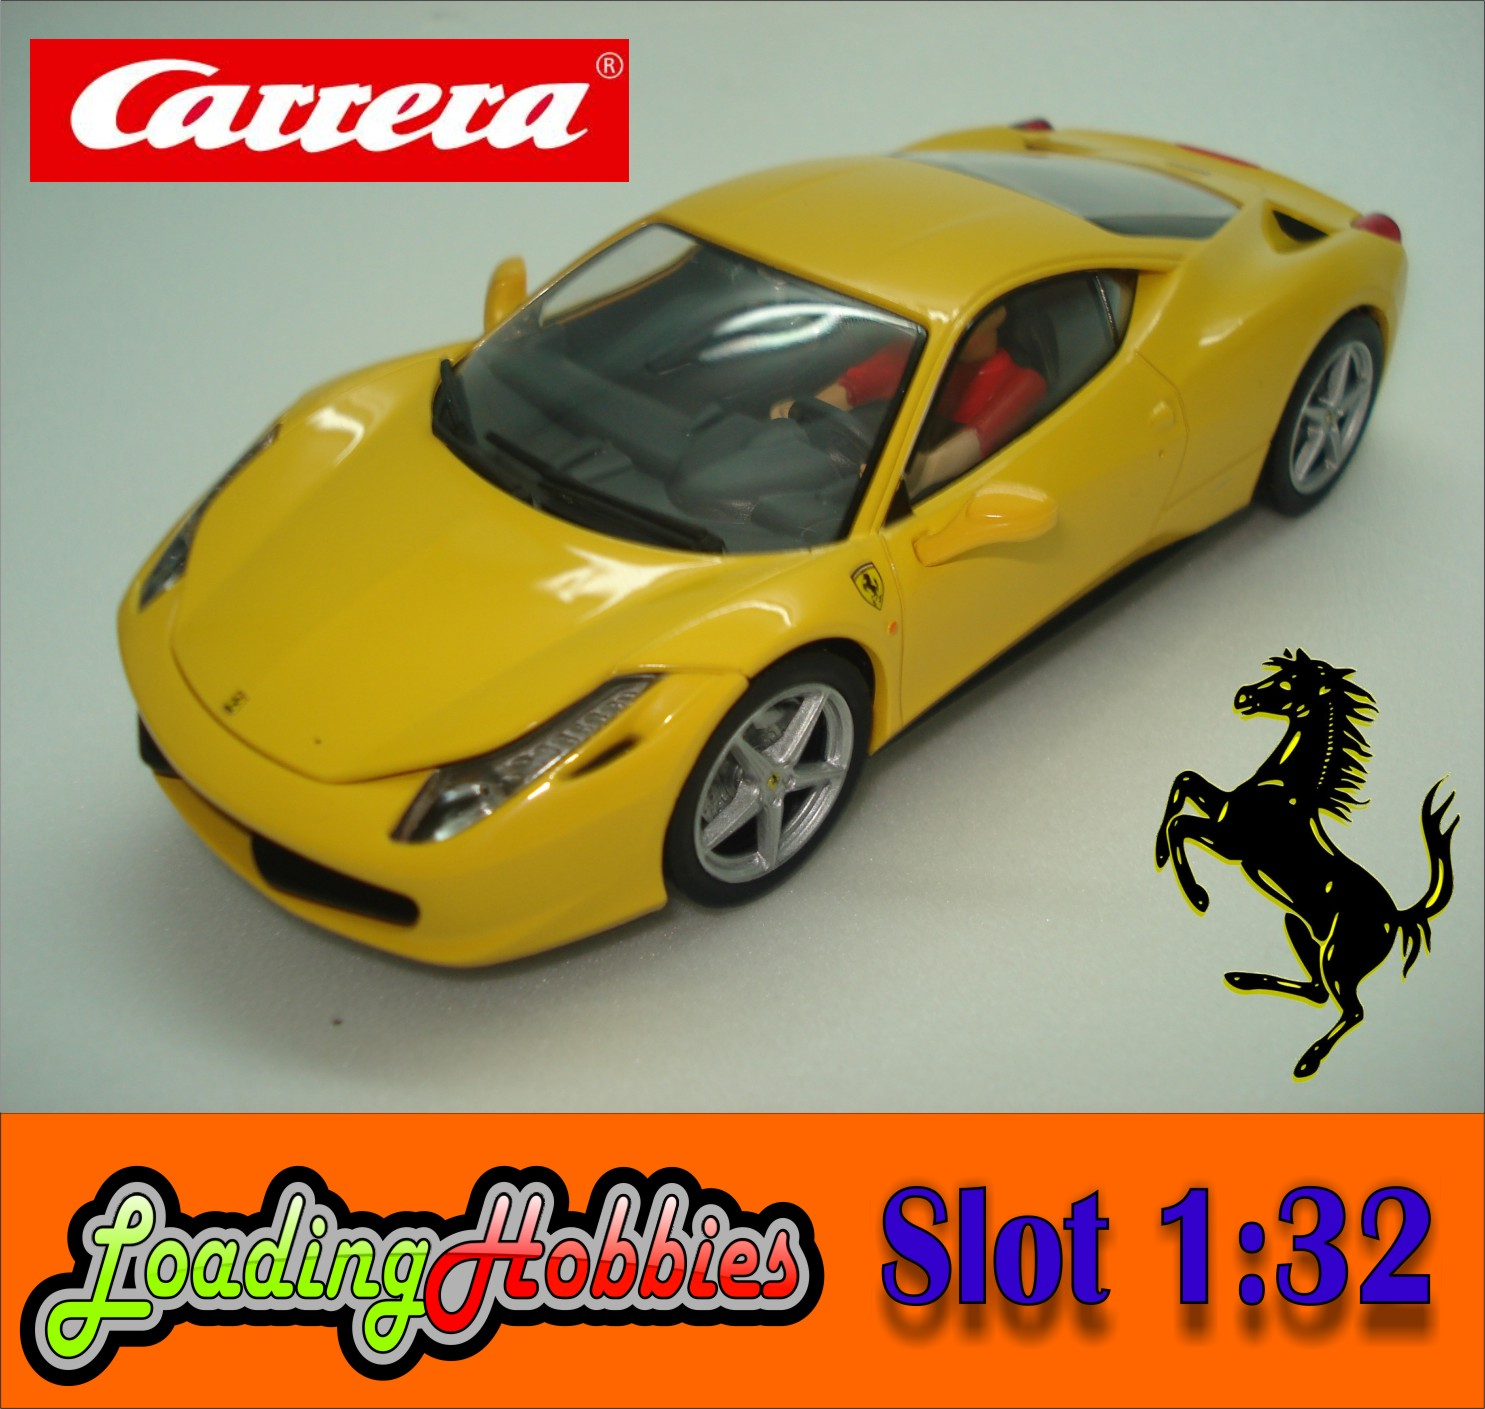 Slot: FERRARI 458 Italia Carrera Slot